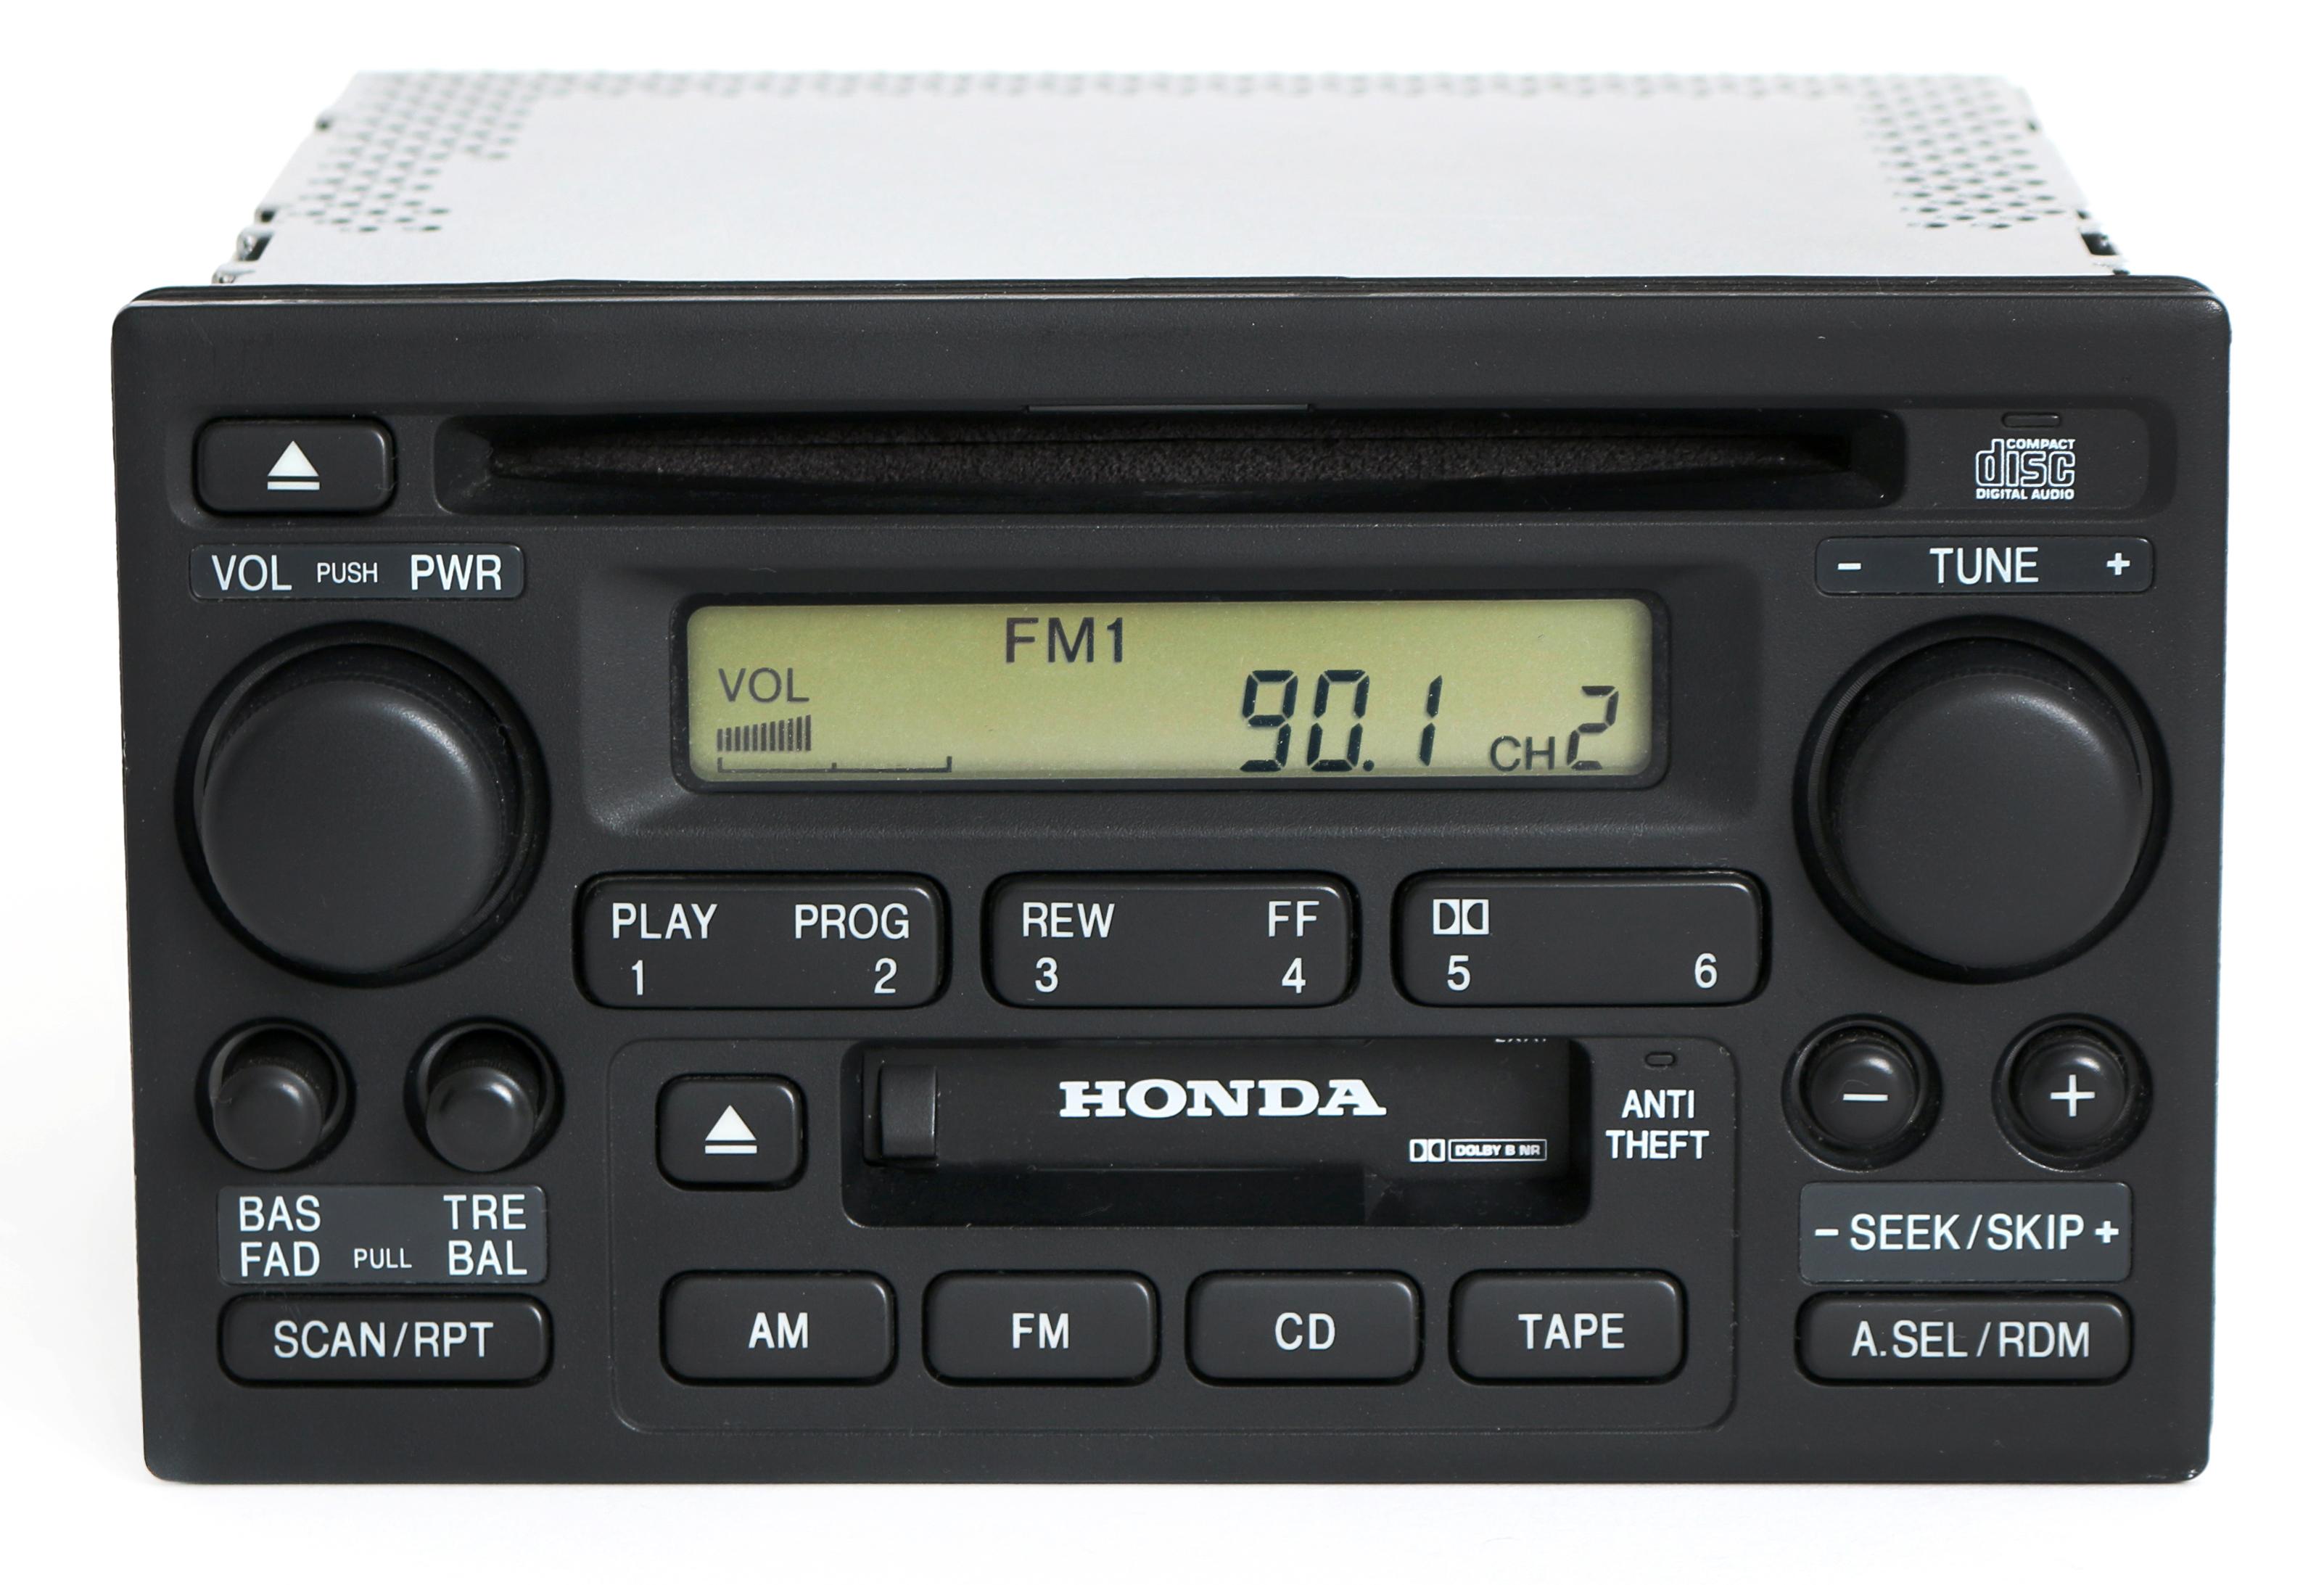 Honda Accord 2001-02 Radio AM FM CD Cassette Player 39101-S84-A510-M1 Face 2XA1 Refurbished by Honda